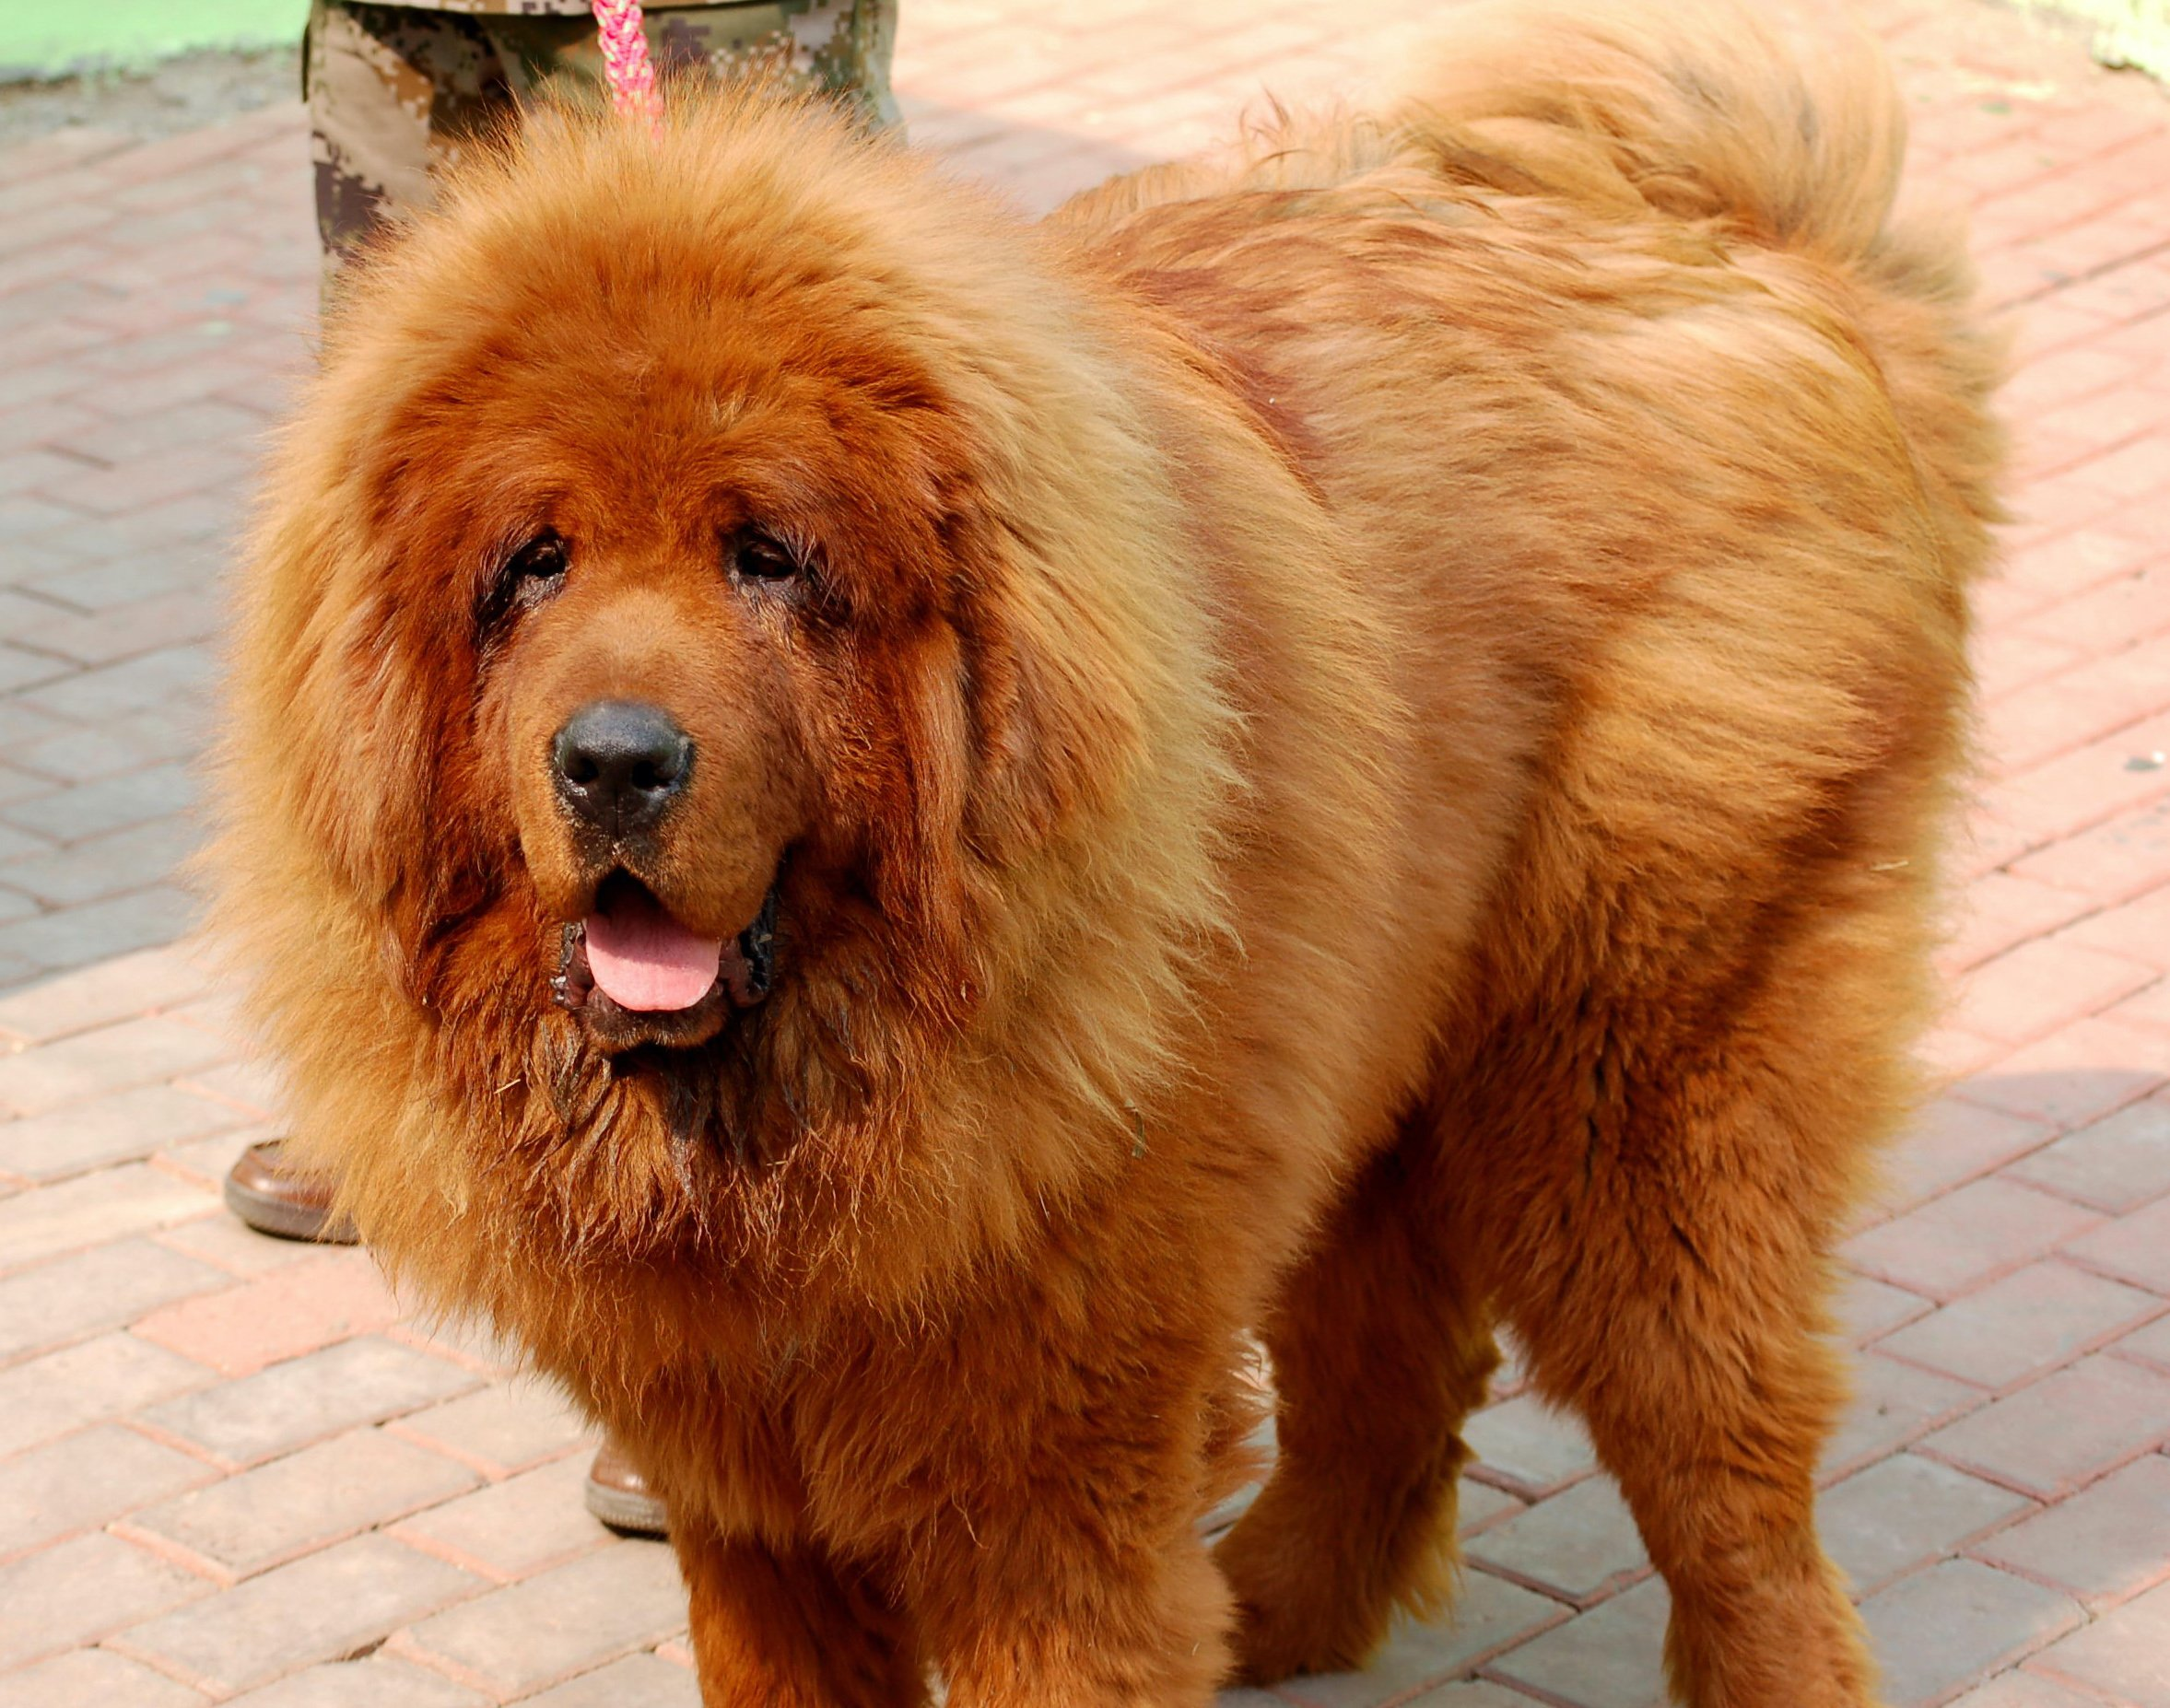 A Tibetan mastiff called Big Splash